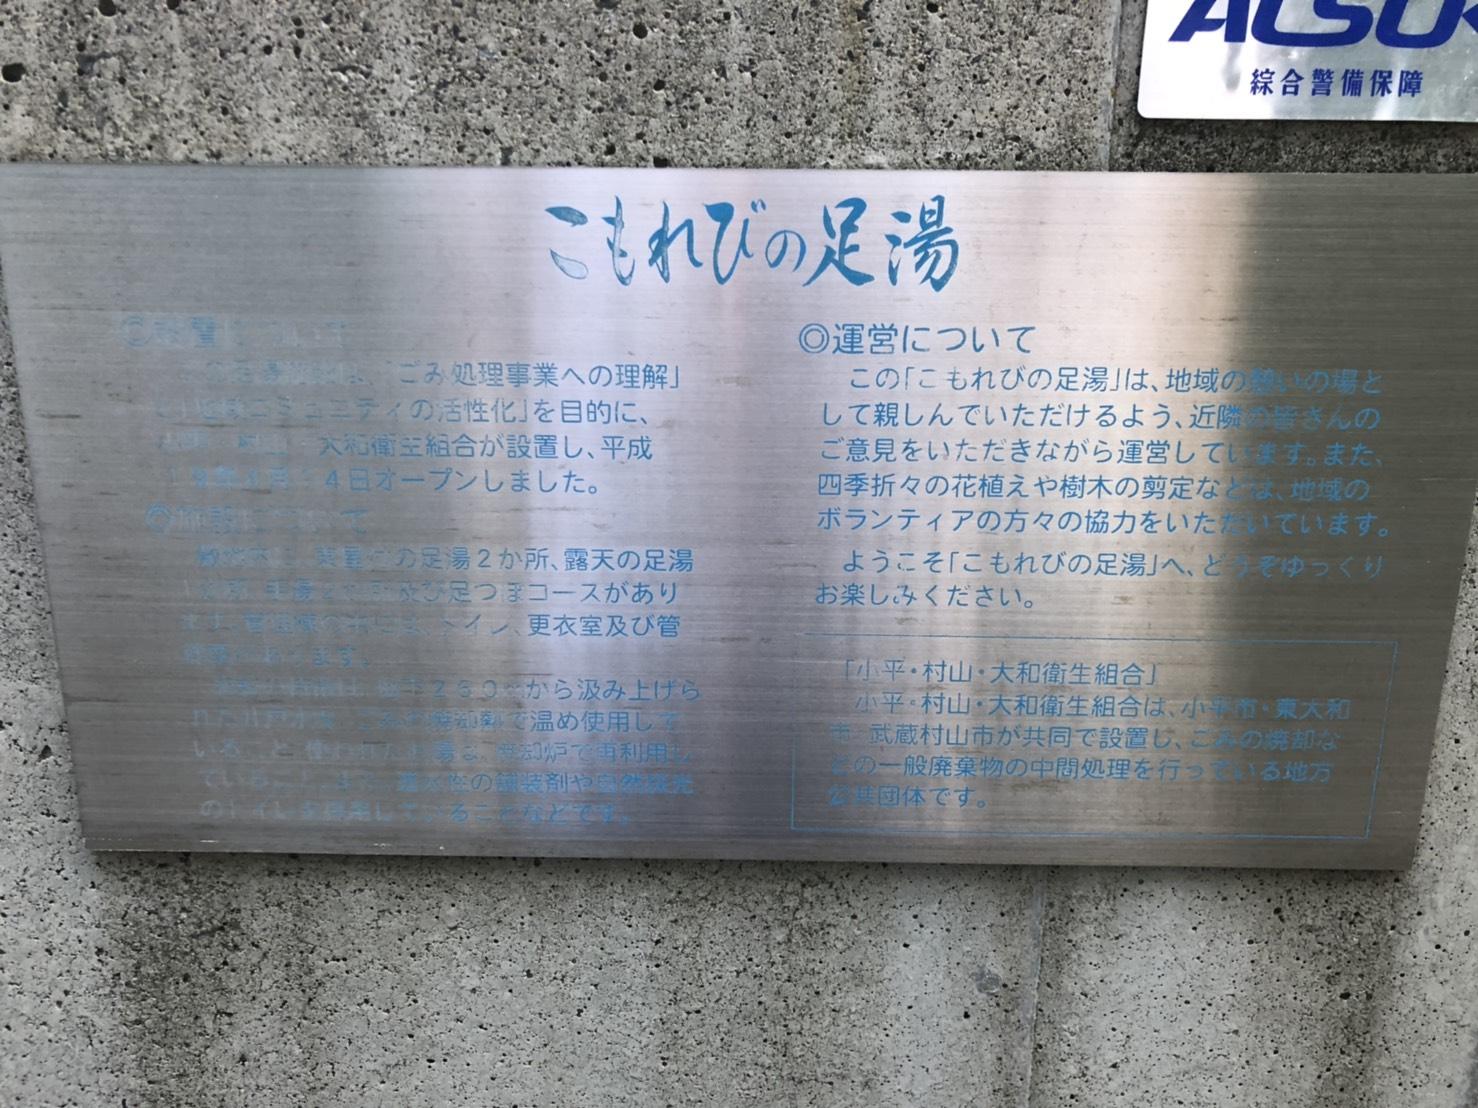 S__25264140.jpg